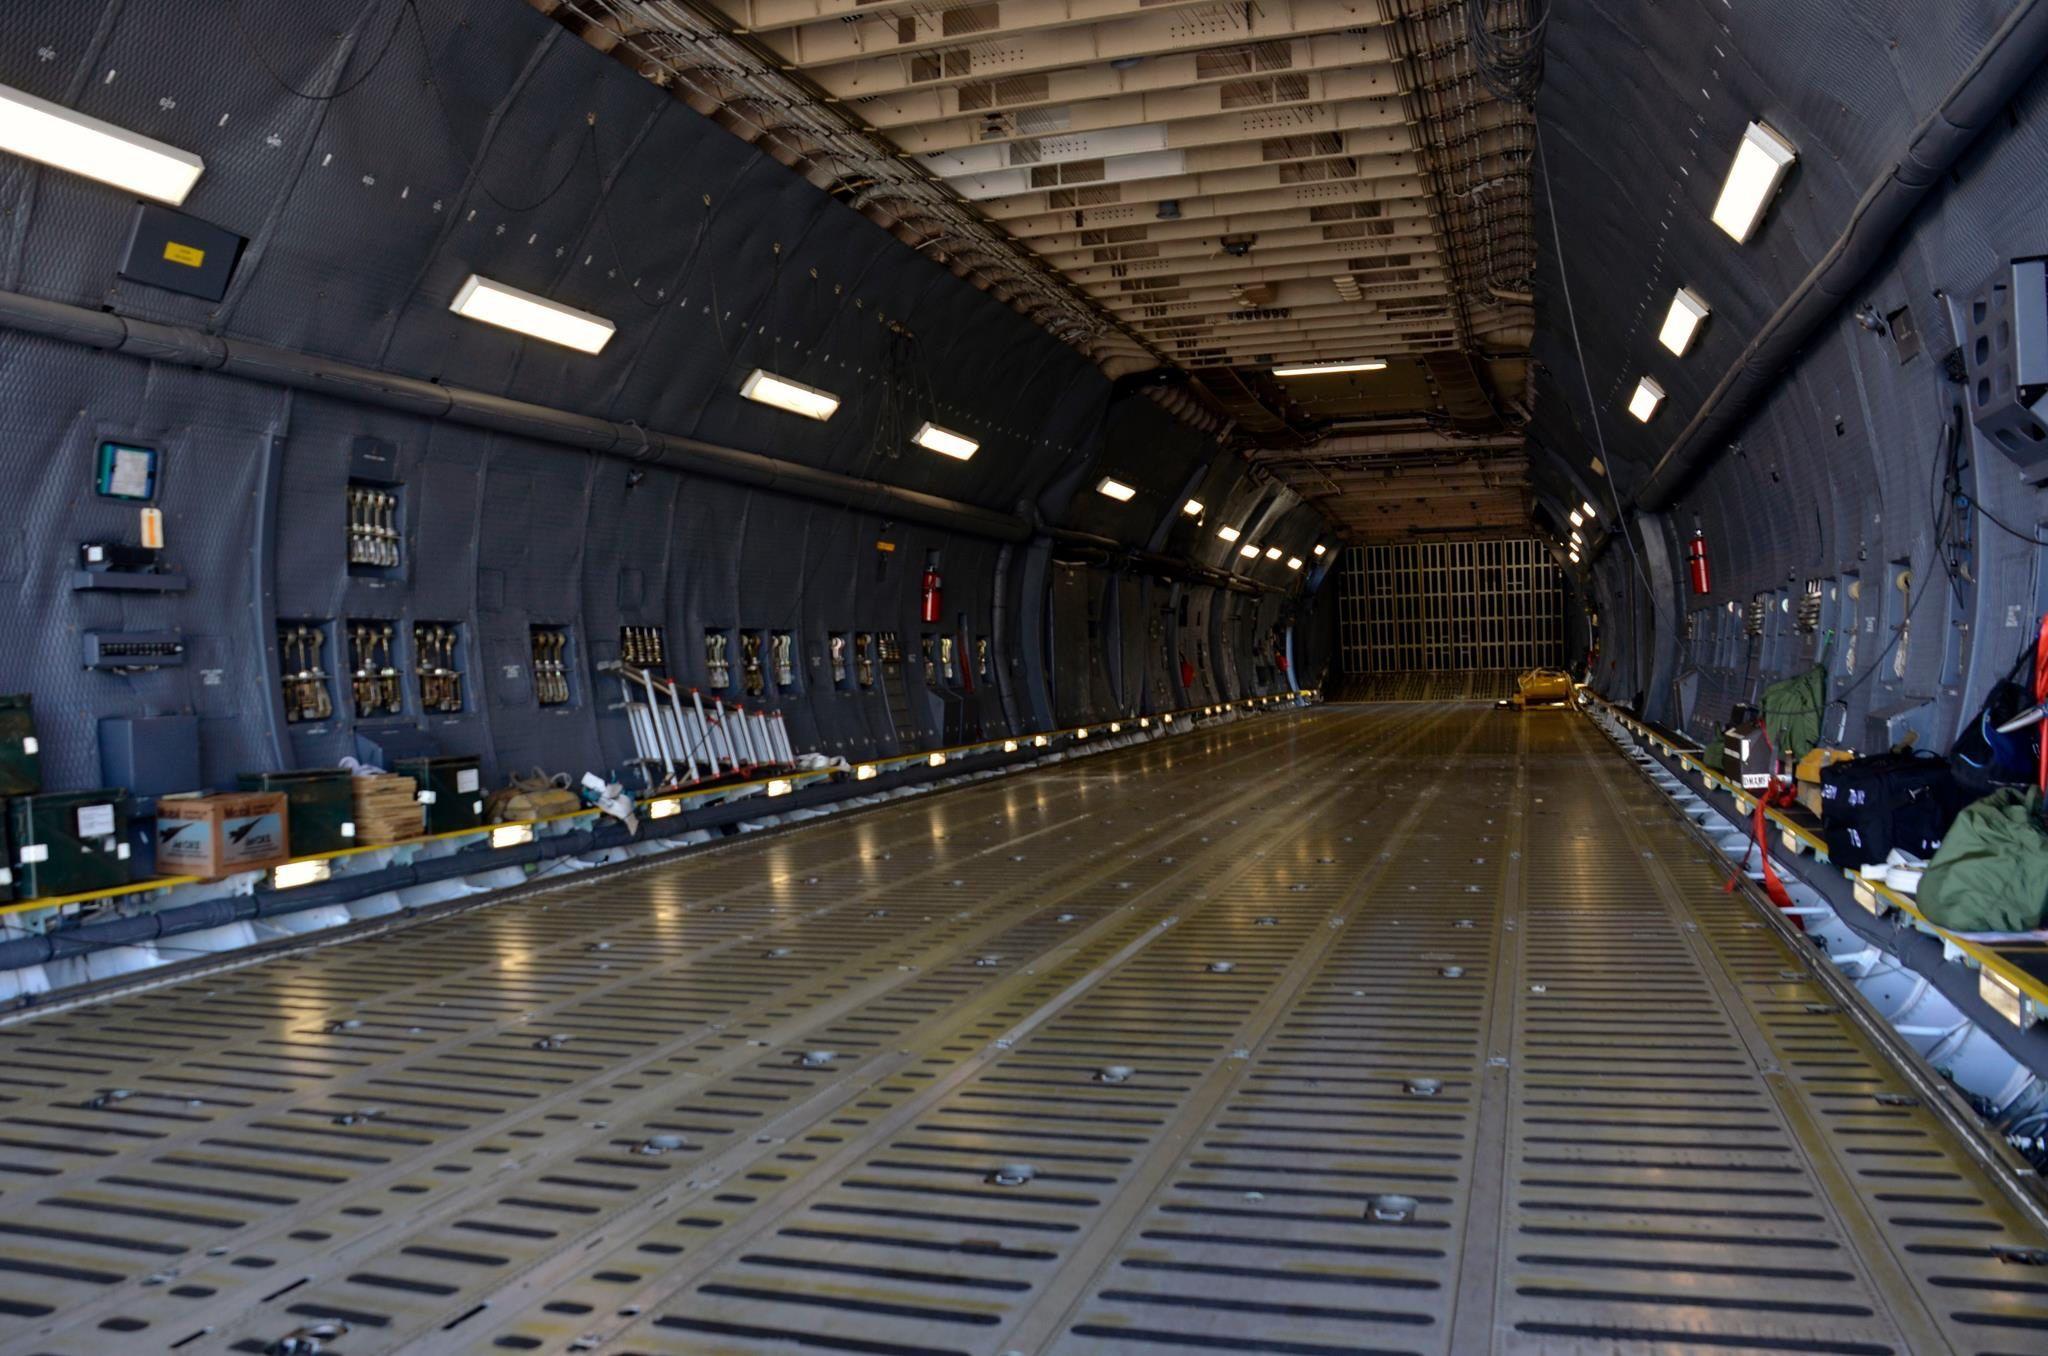 C-5 Galaxy interior. | Aviation | Pinterest | Planes ...